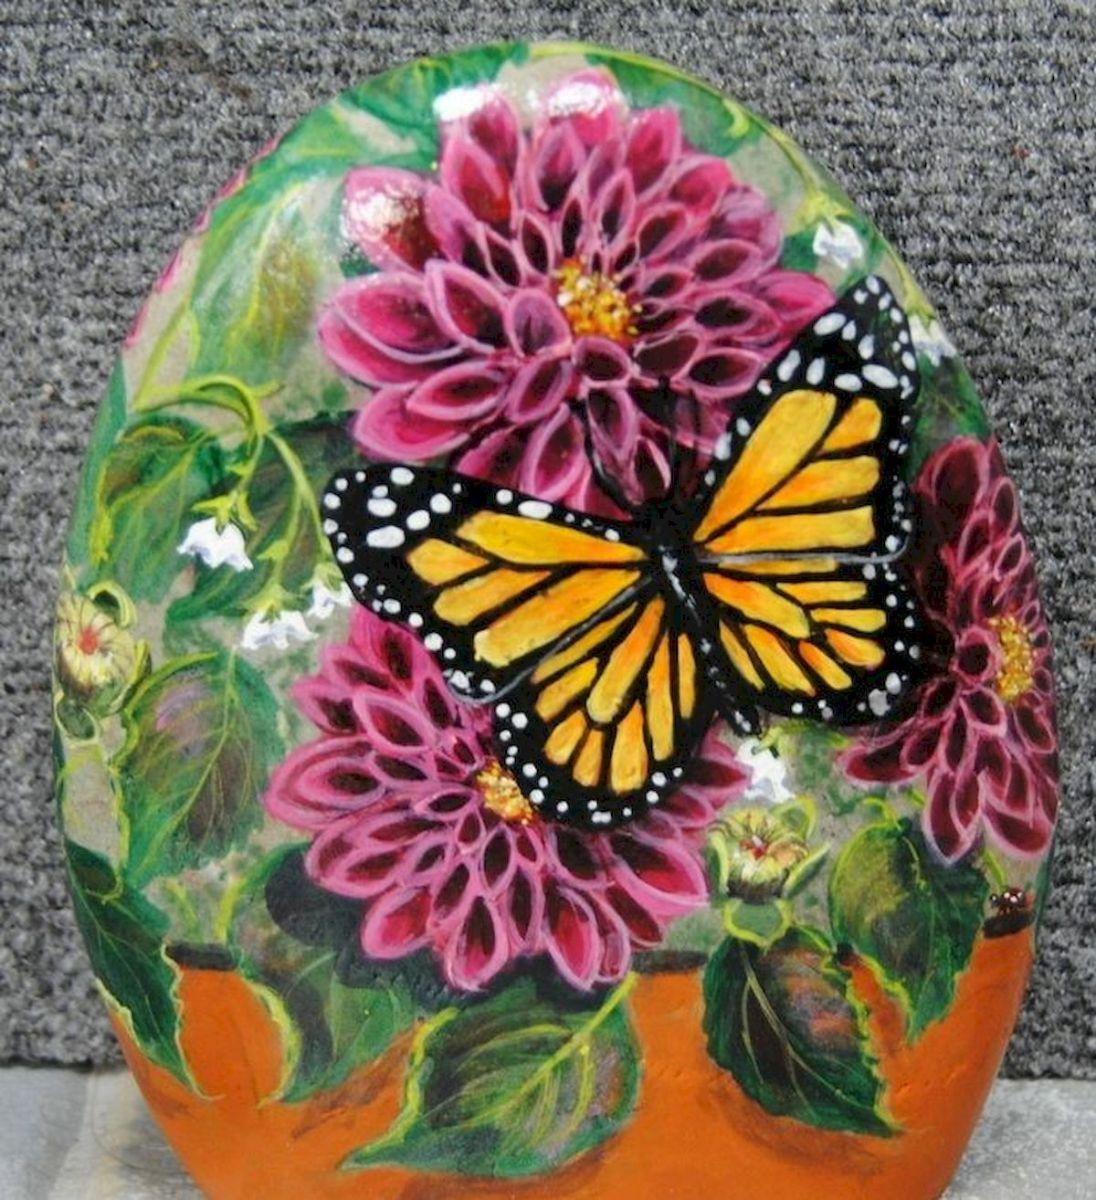 55 Cute DIY Painted Rocks Animals Butterfly Ideas (12)